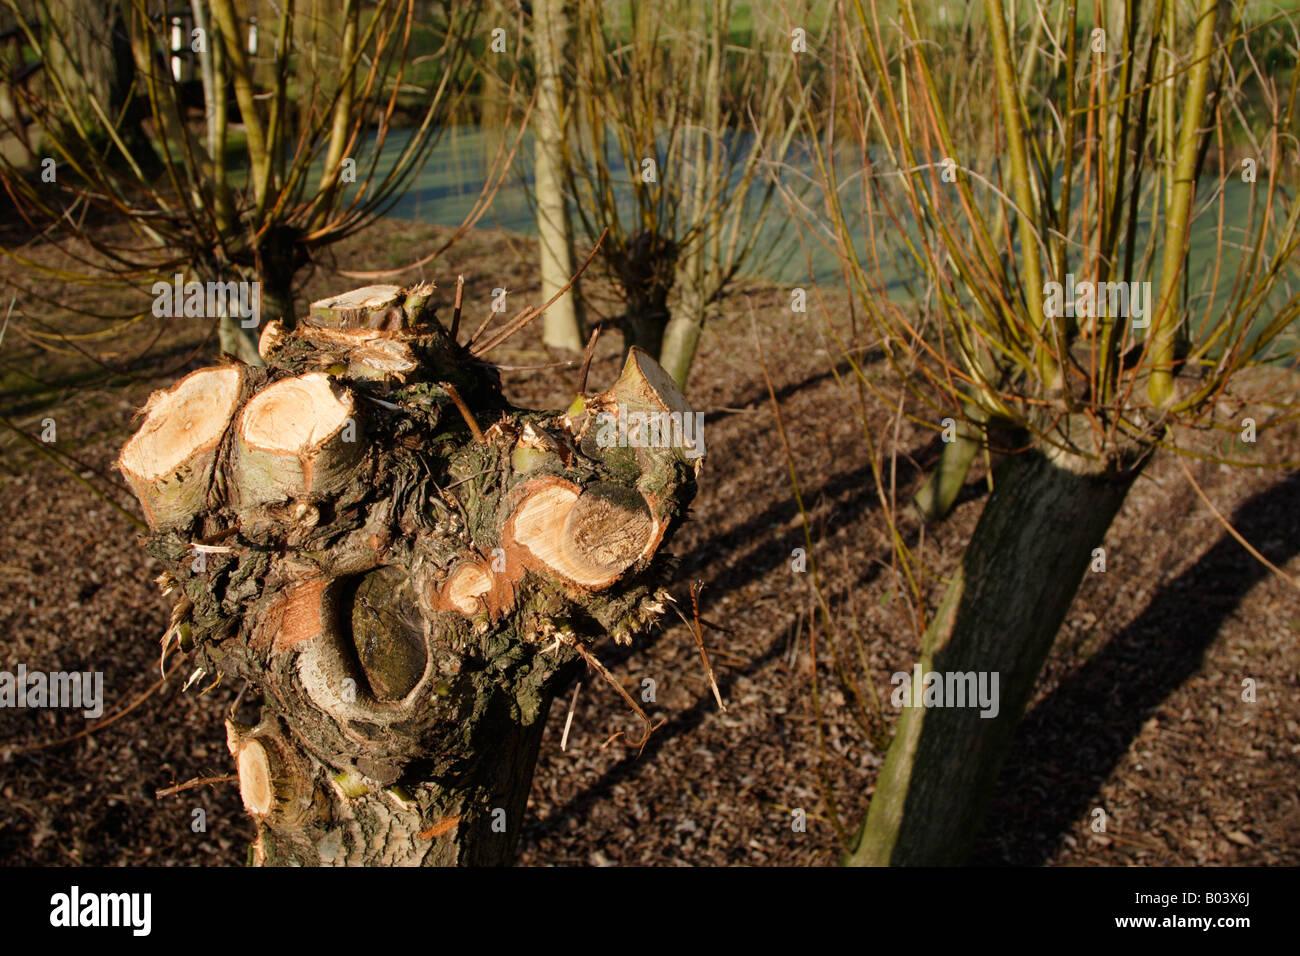 Pollarded willow Salix genus tree England UK - Stock Image